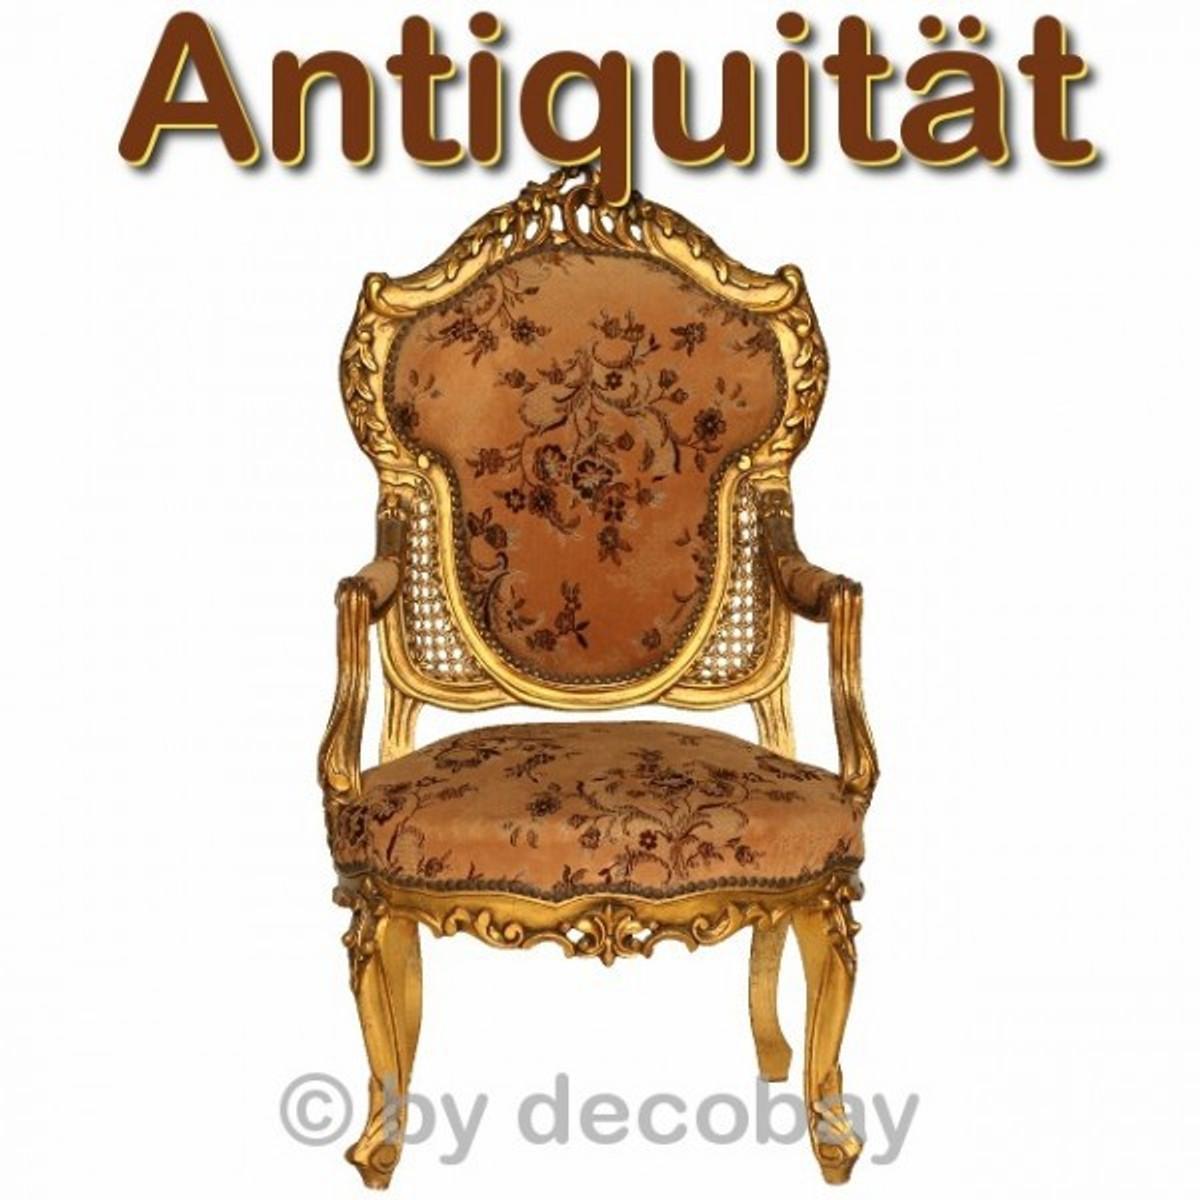 Alte Möbel Antiquitäten Barock Stuhl Armlehne 1 Sessel Beige Blumen  Holzrahmen